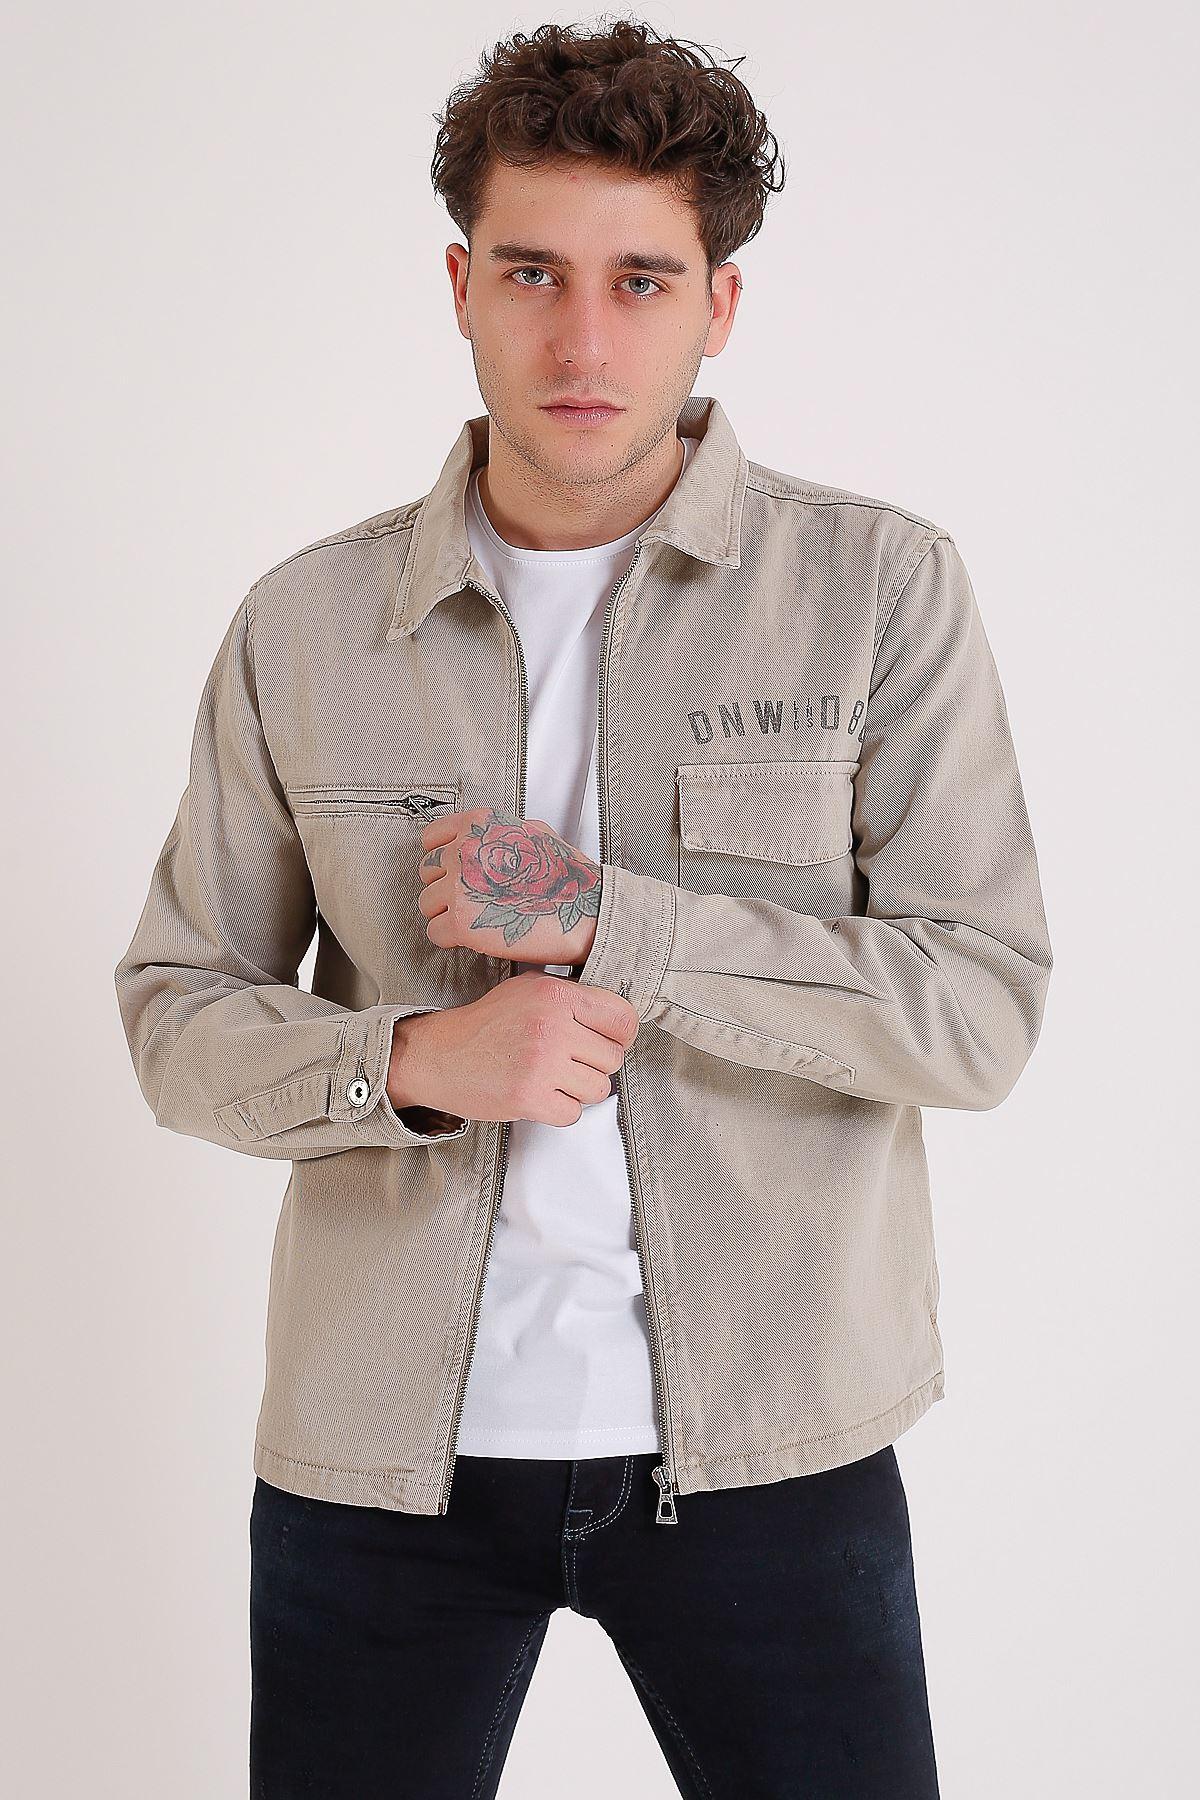 Premium Pamuklu Bej Ceket Cep Fermuar Ve Detay Baskı